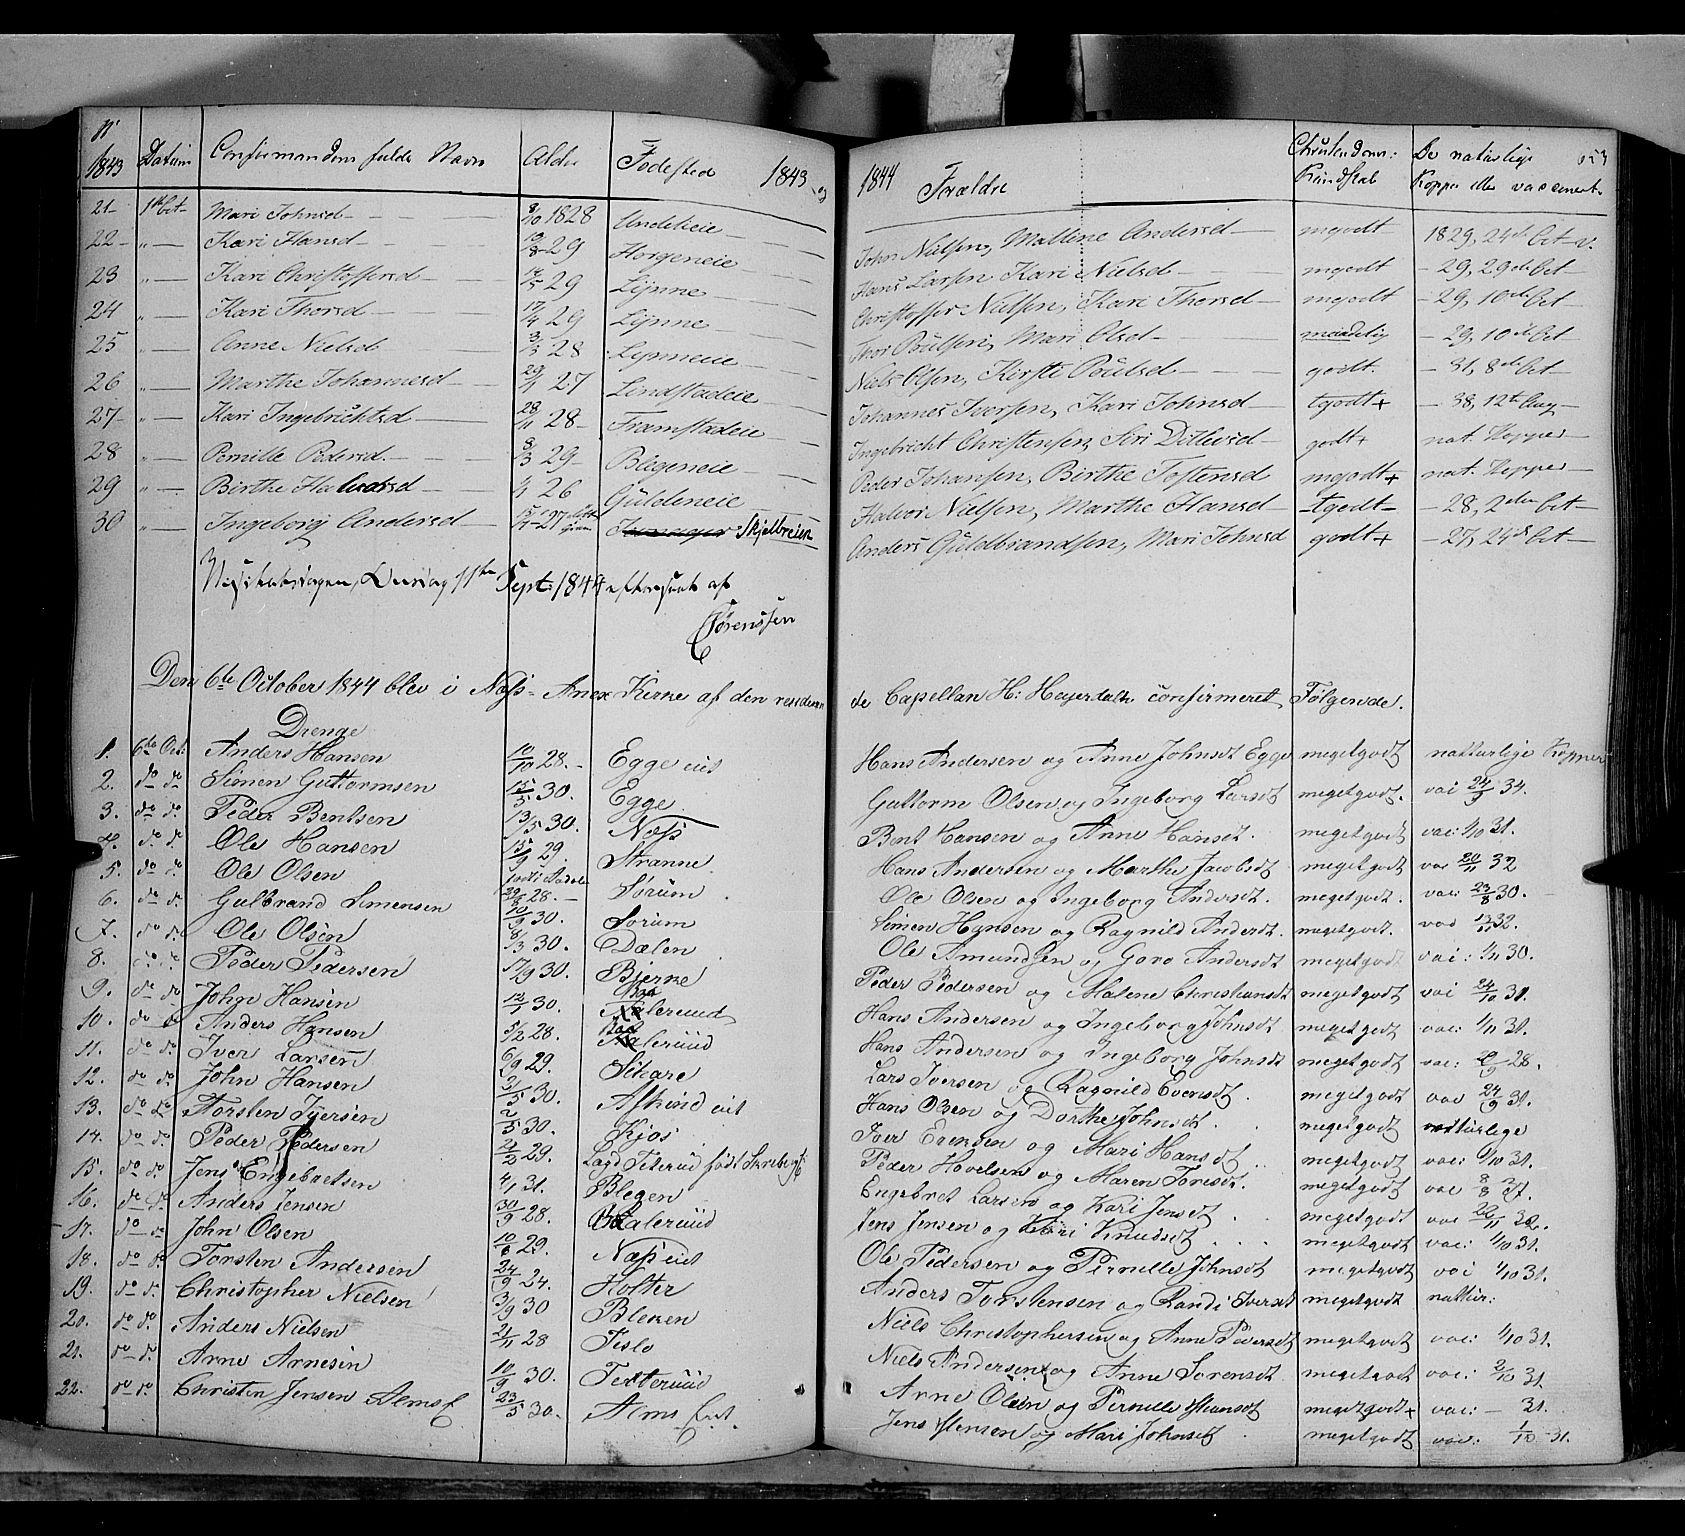 SAH, Gran prestekontor, Ministerialbok nr. 11, 1842-1856, s. 652-653